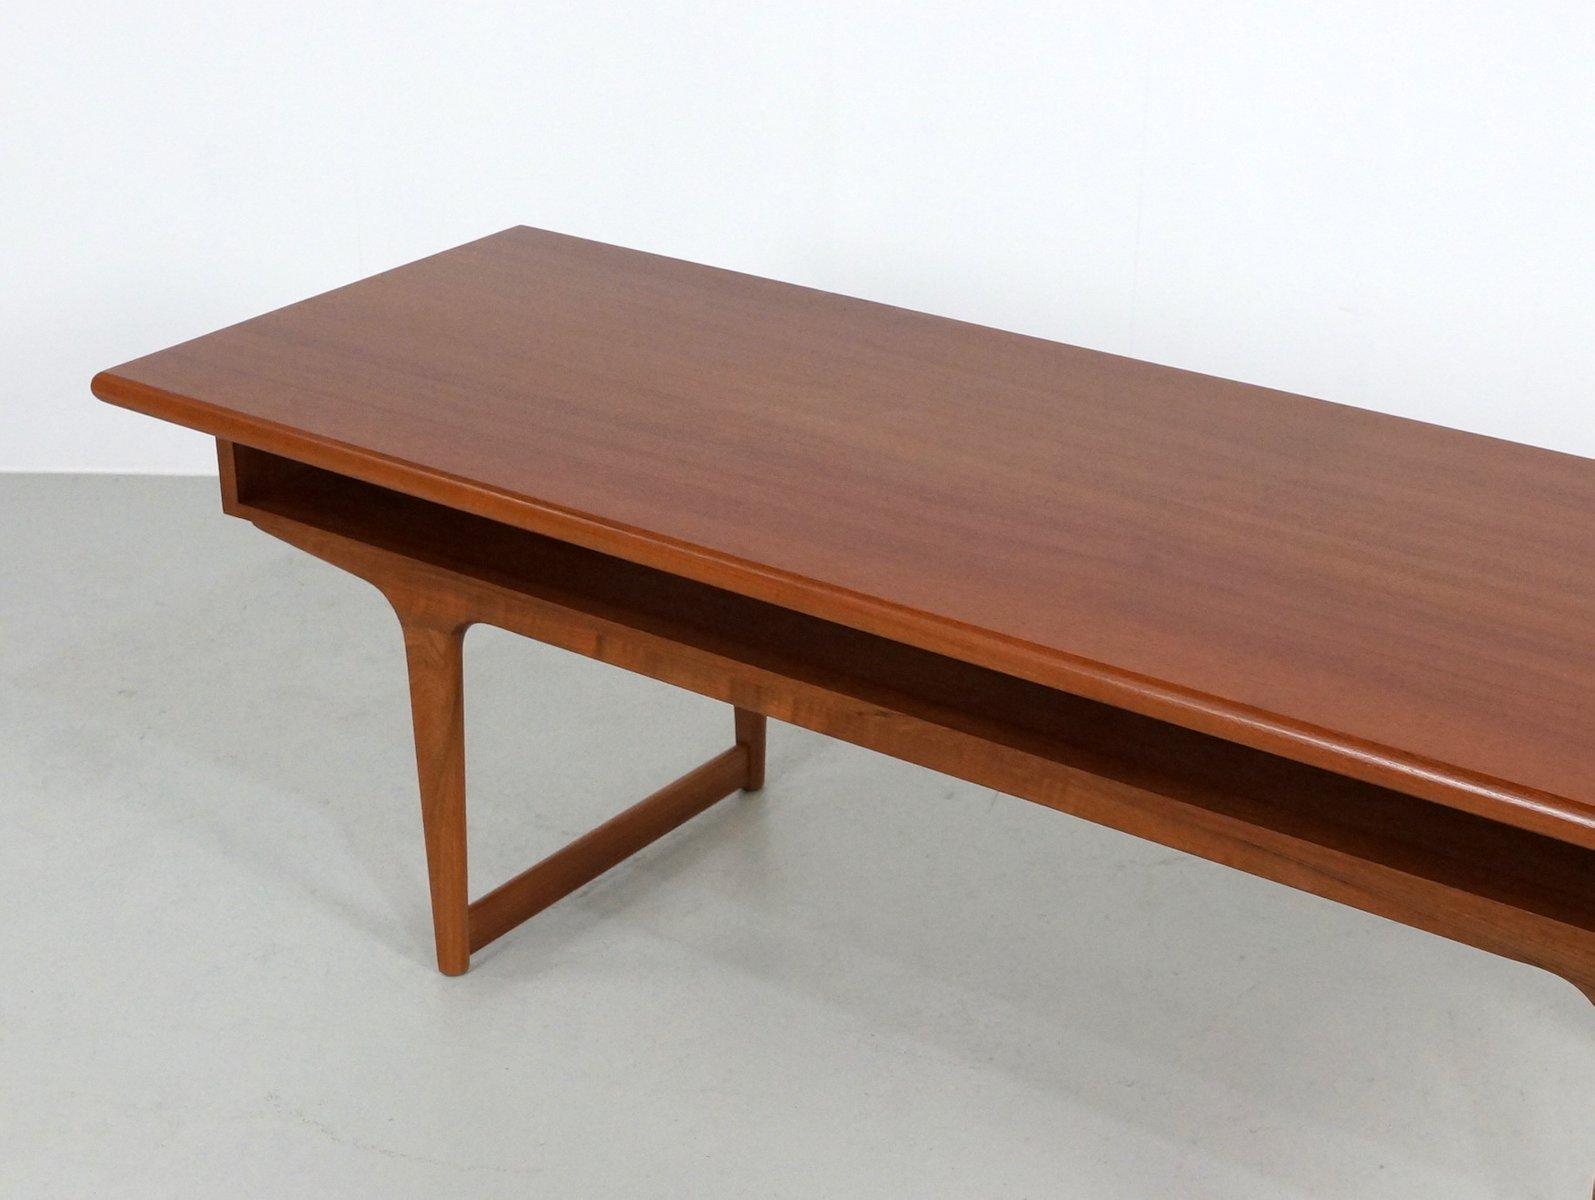 Danish coffee table rascalartsnyc large teak danish coffee table 1960s for at pamono geotapseo Choice Image